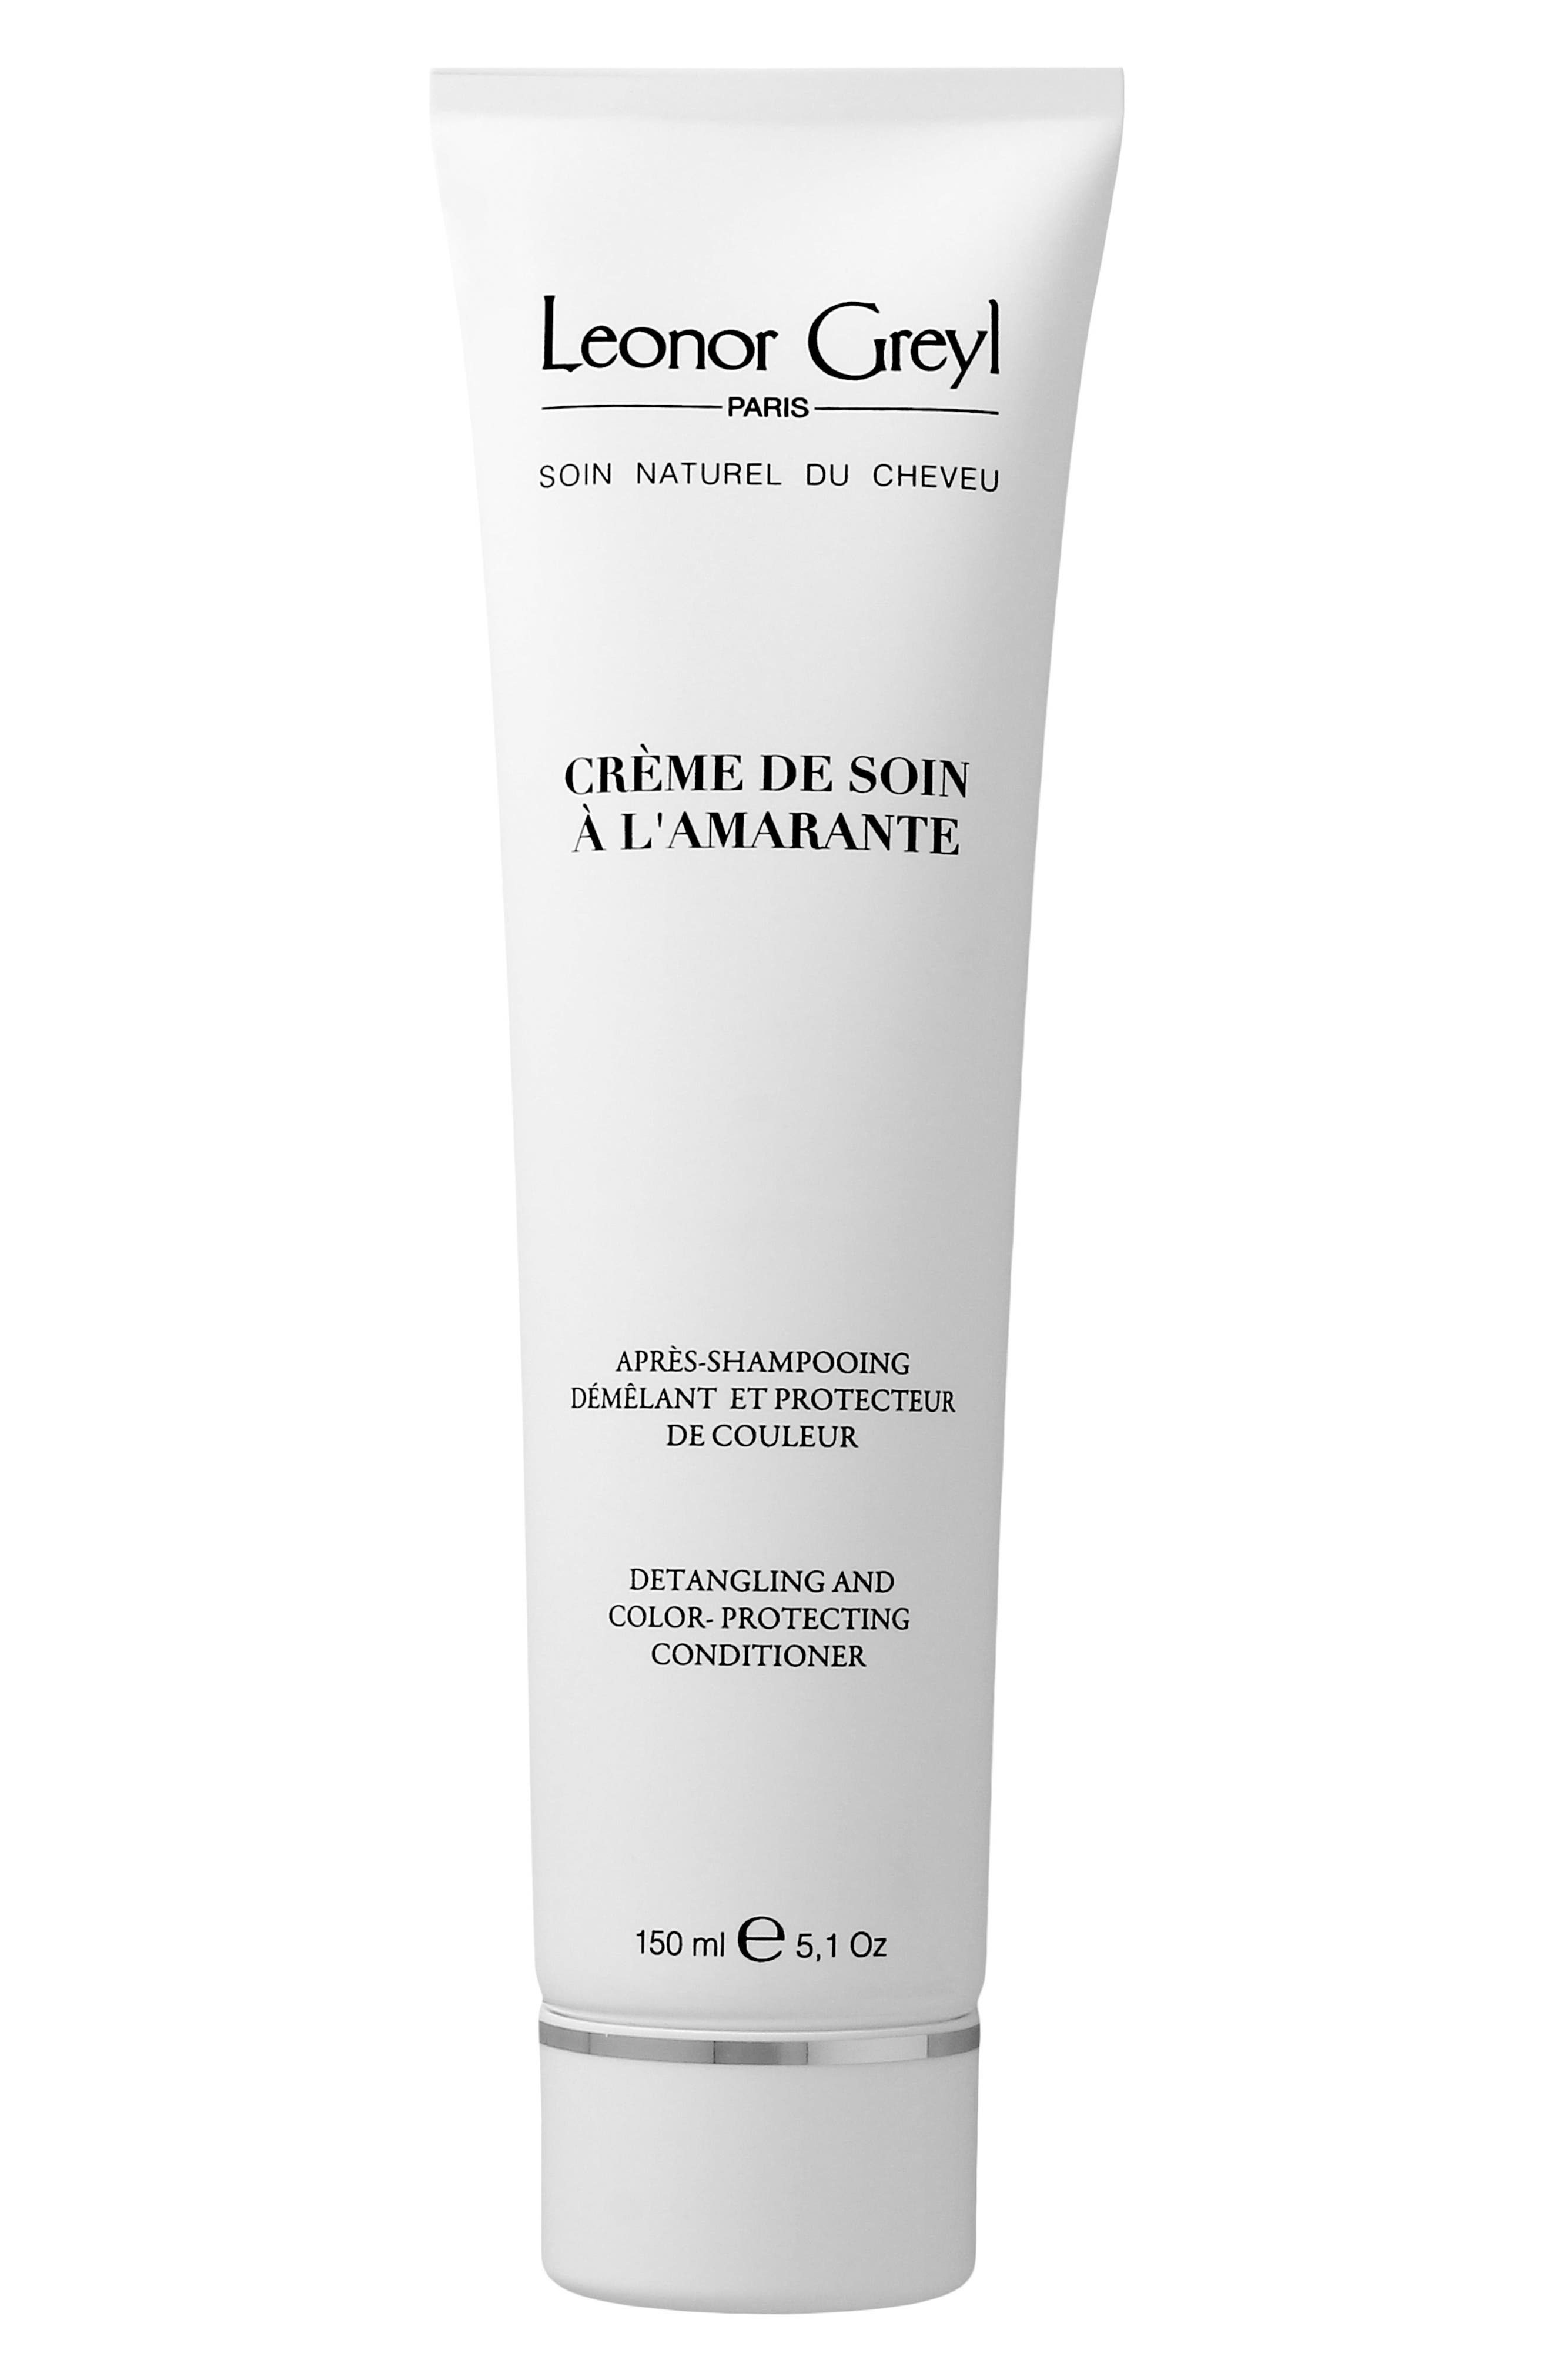 Main Image - Leonor Greyl PARIS Crème de Soin a l'Amarante Conditioner